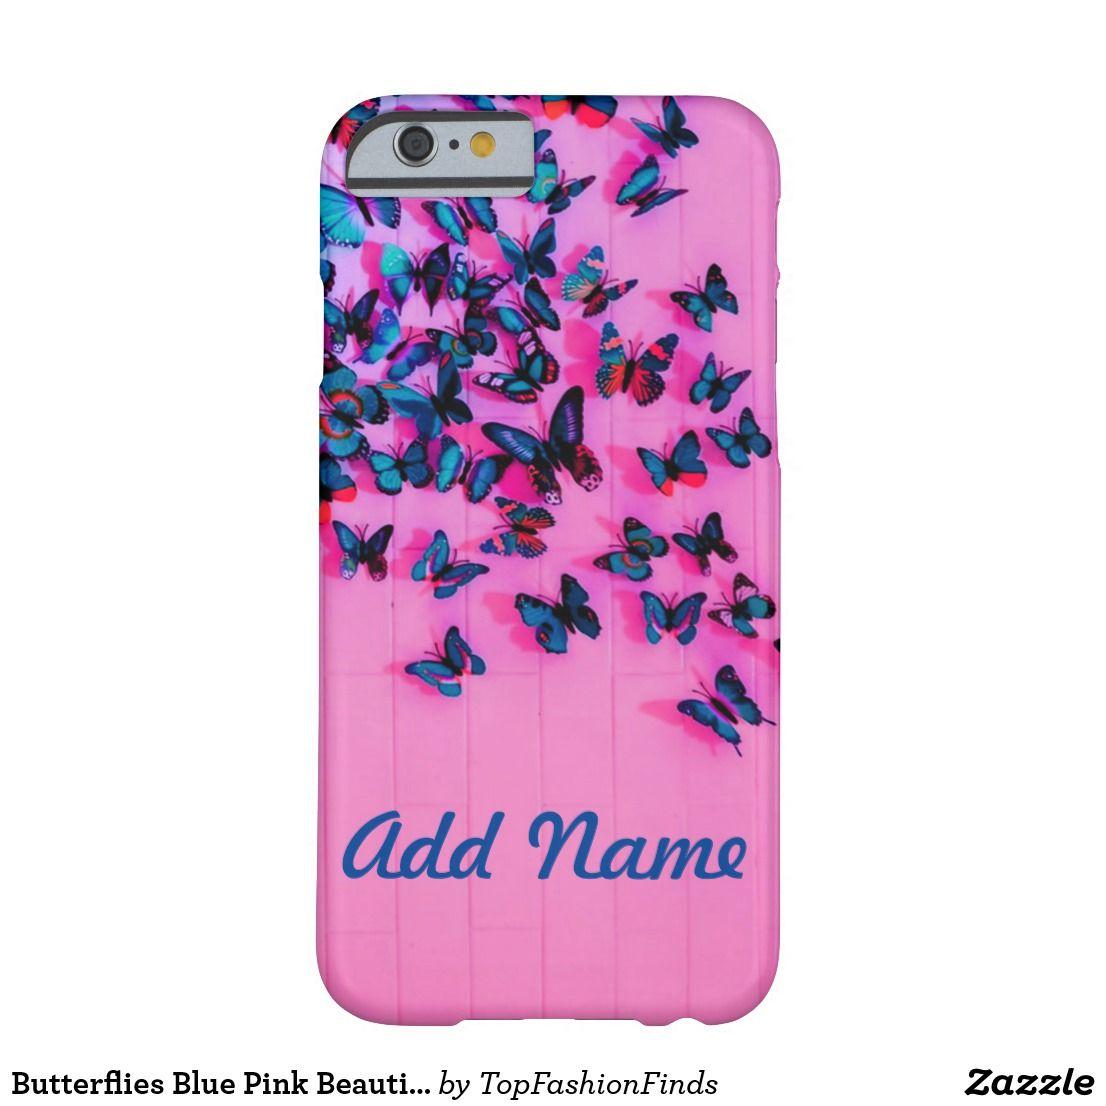 Butterflies blue pink beautiful casemate iphone case